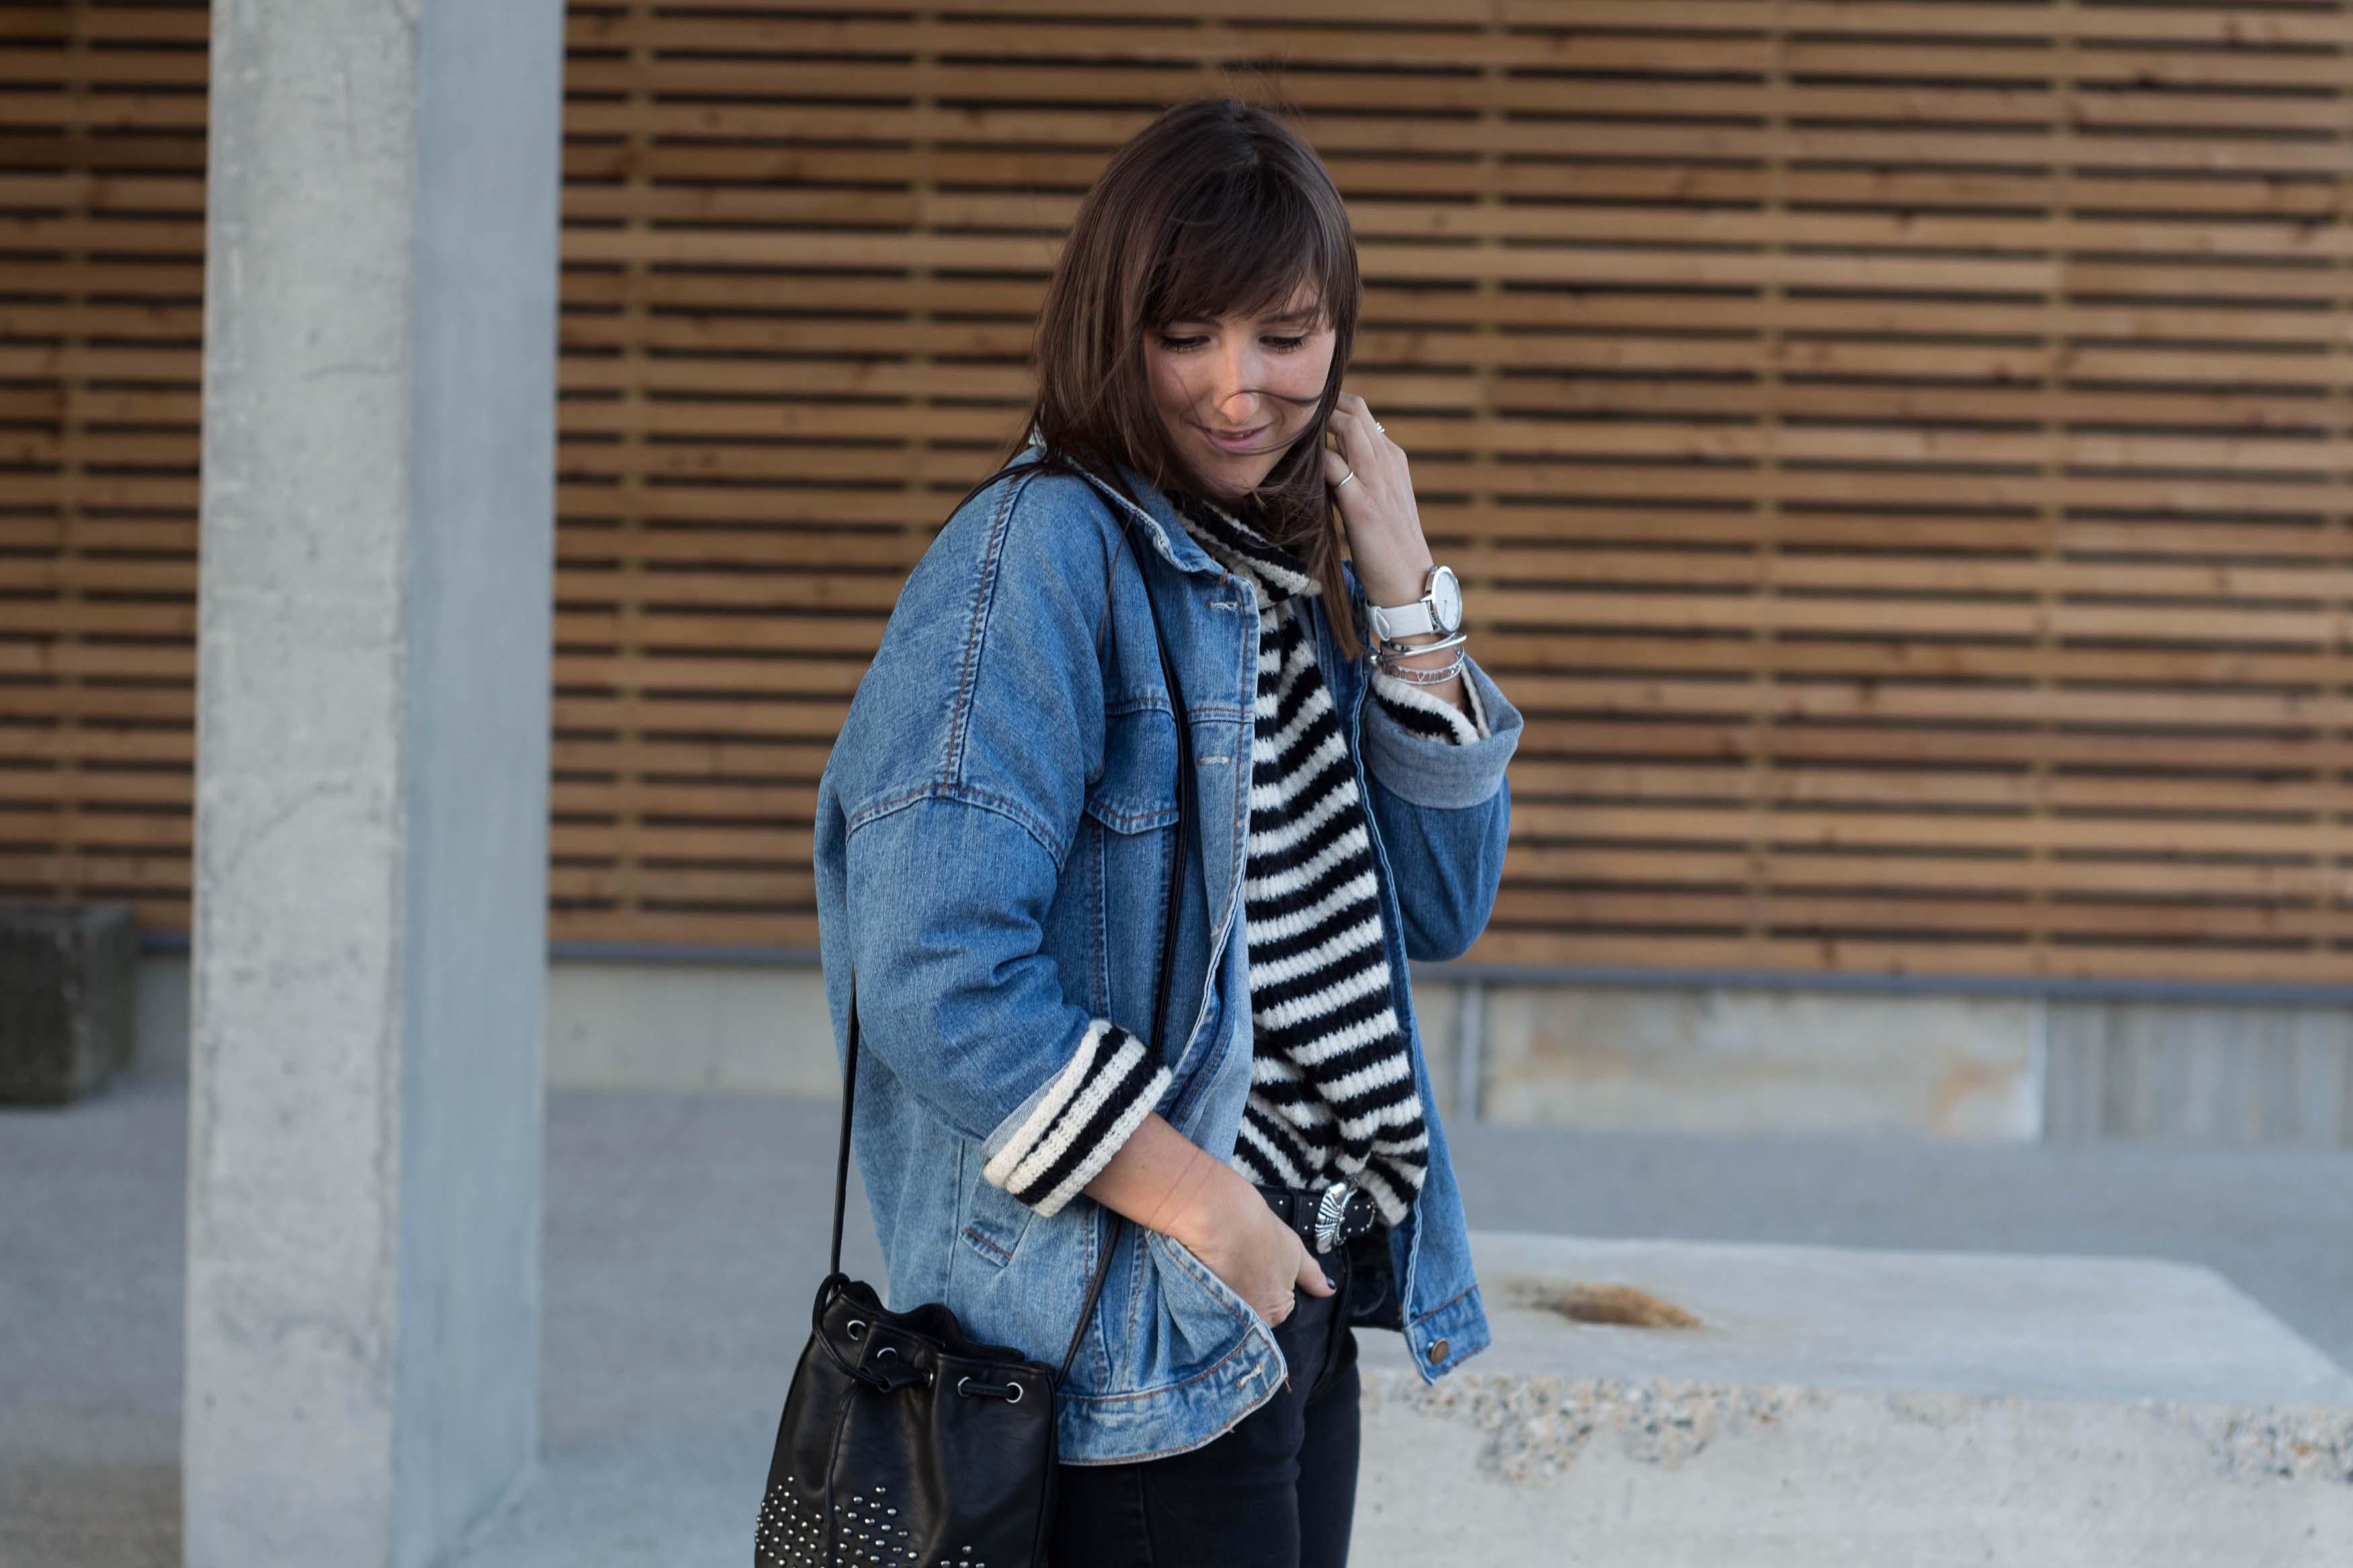 blog-mode-jean-shein-linstantflo-6-sur-18